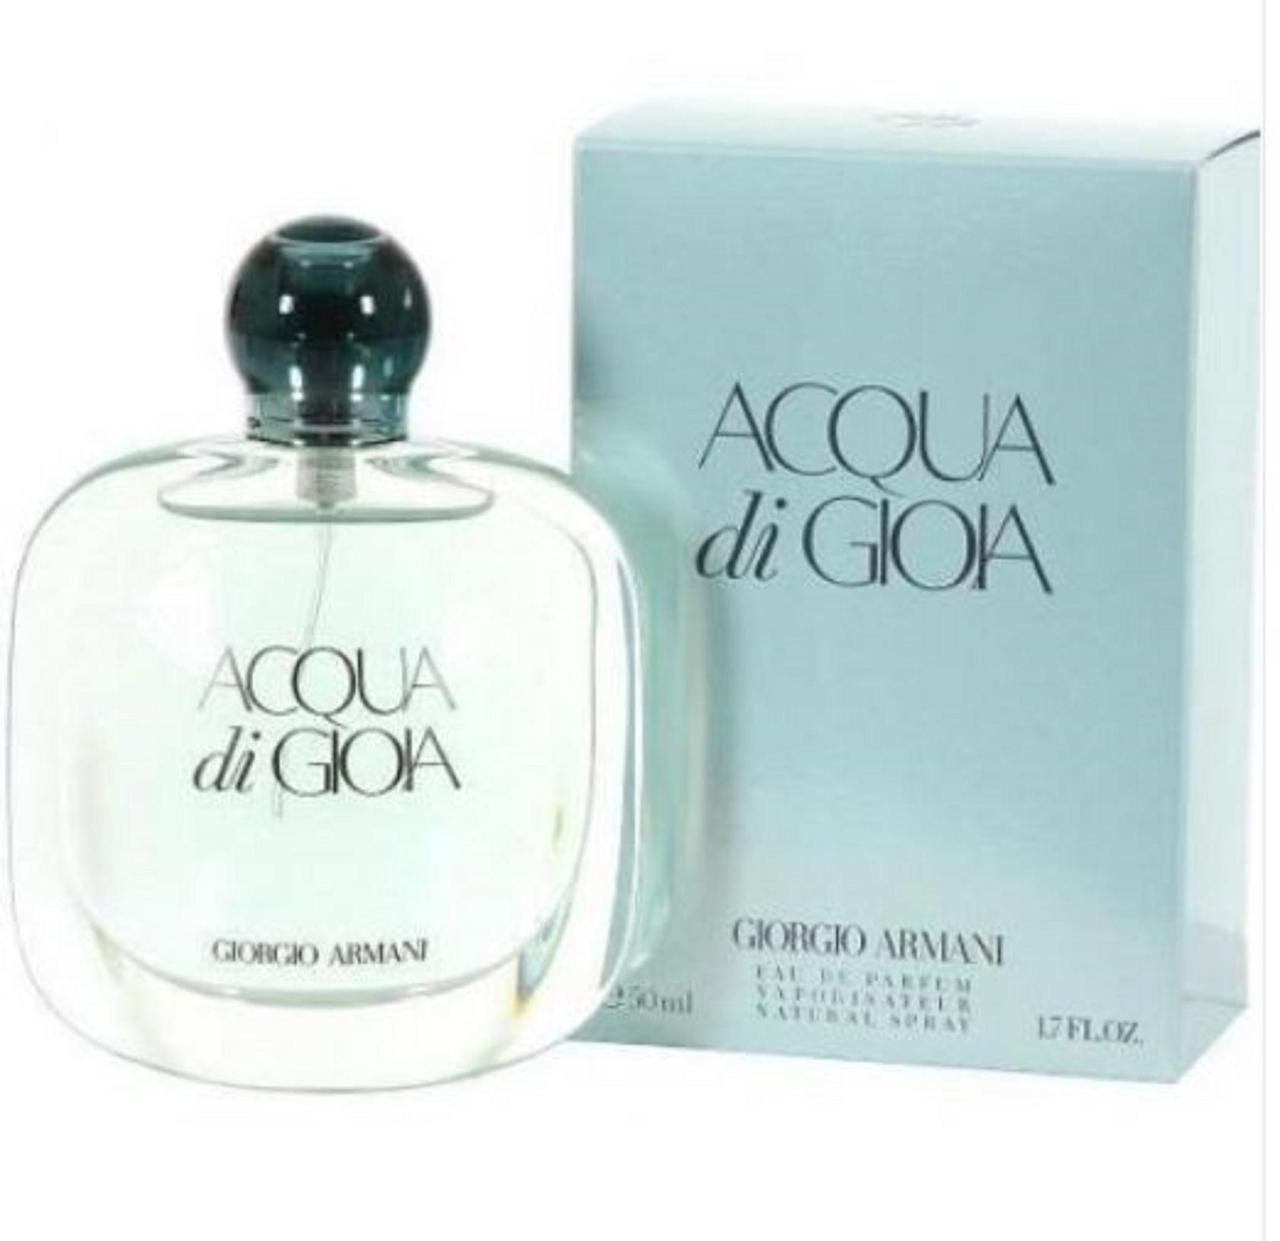 Женский аромат Acqua di Gioia реплика